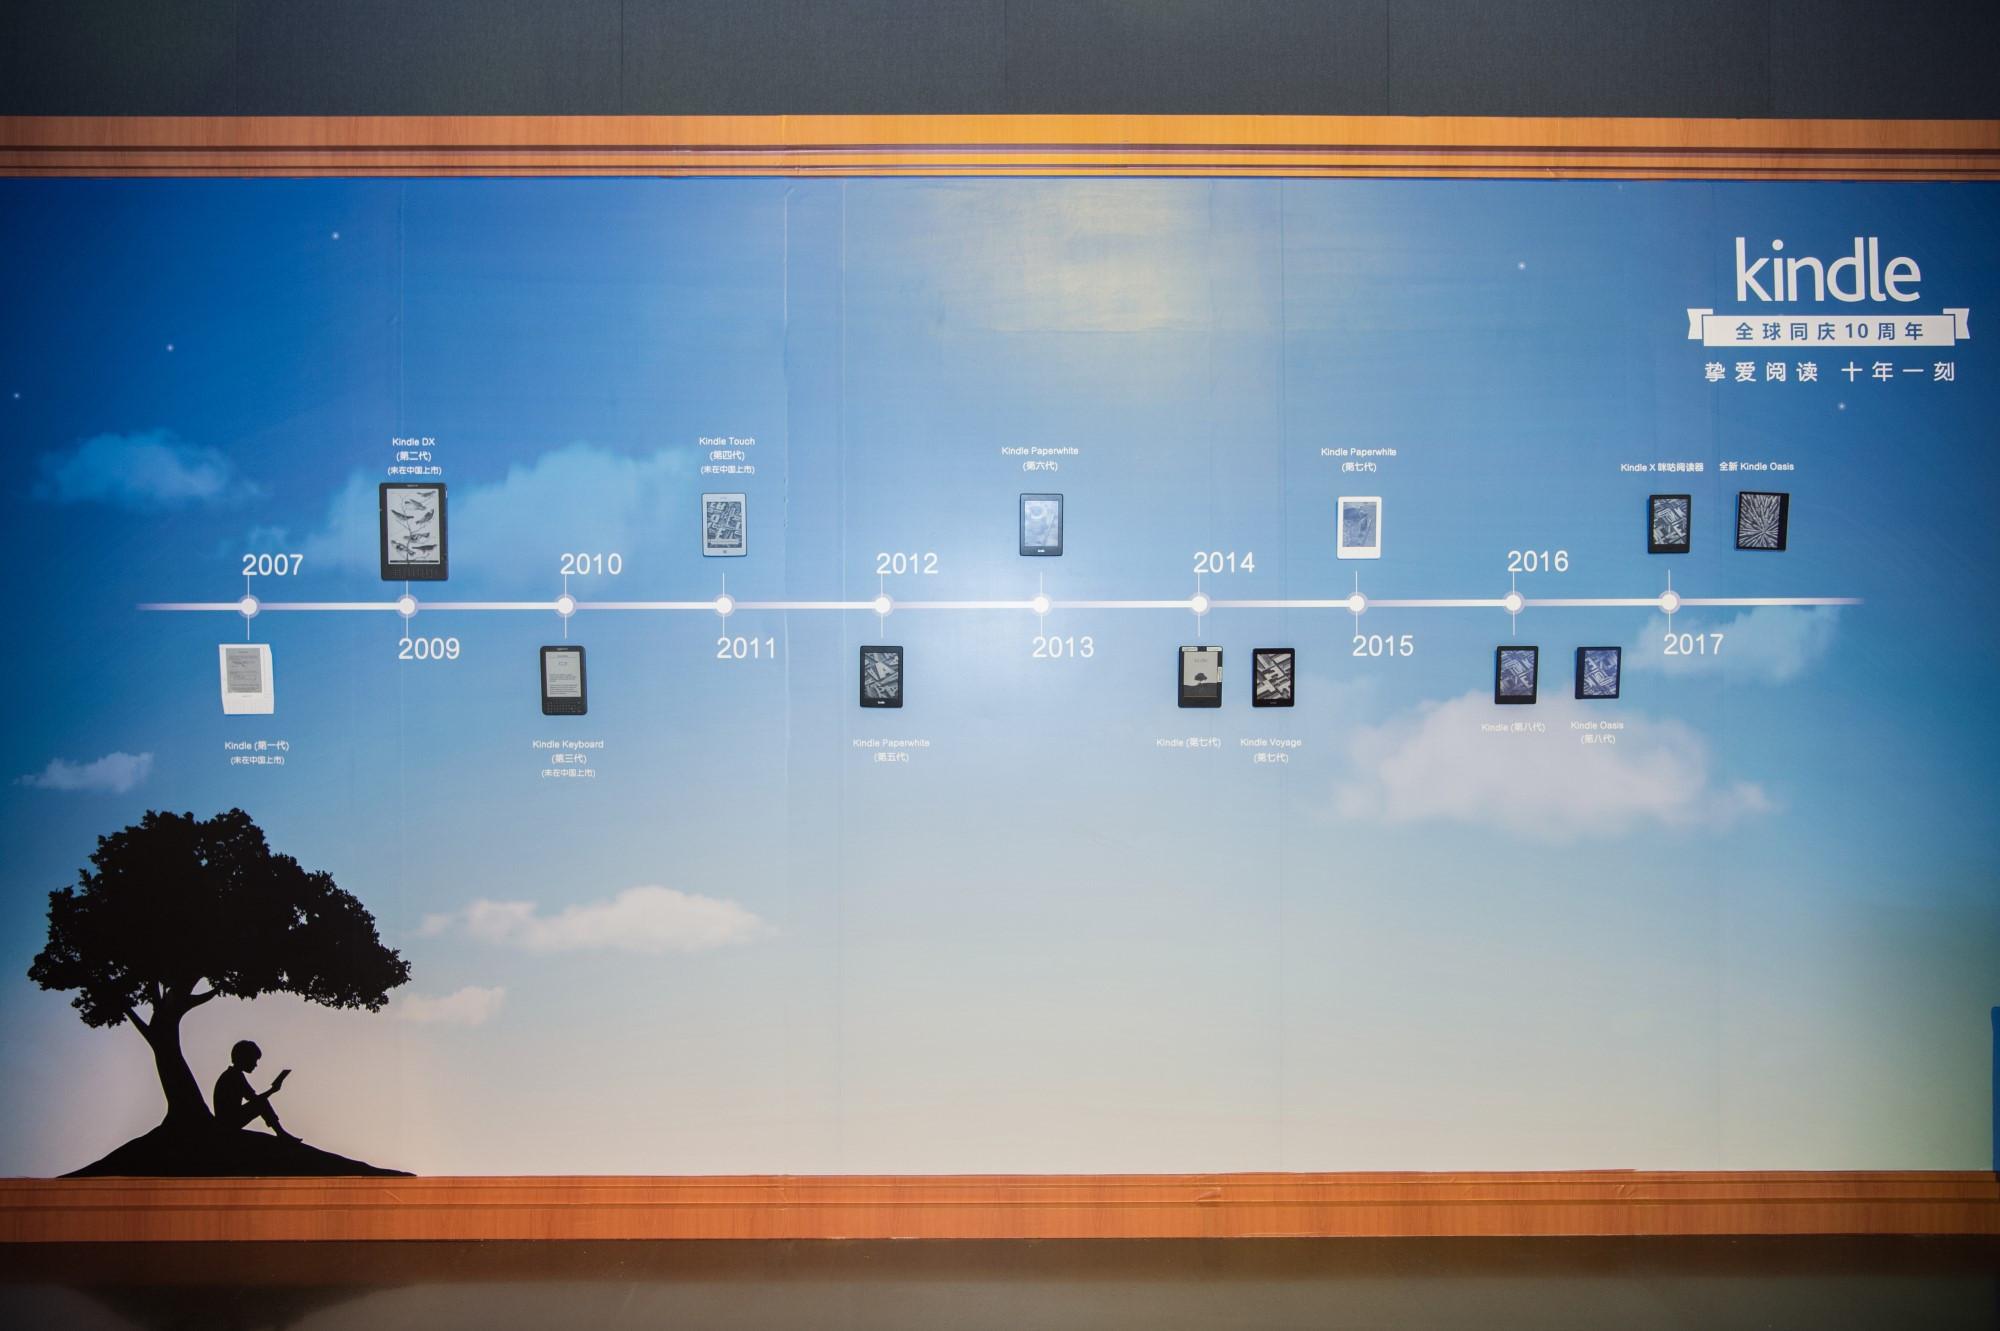 Kindle十年:我们的阅读是如何被改变的